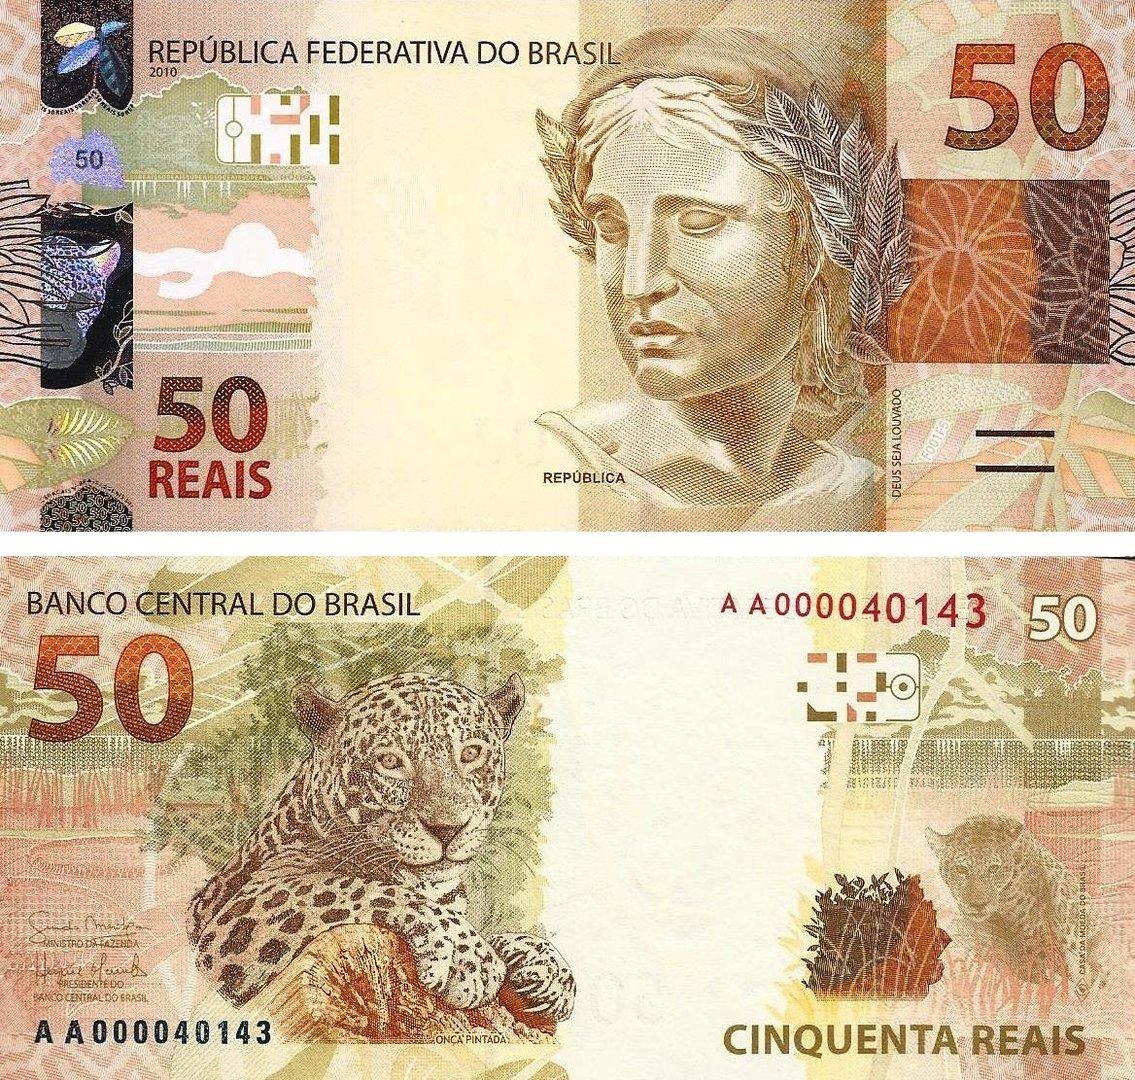 Brasil - 50 Reais 2010(11) - N V M V S